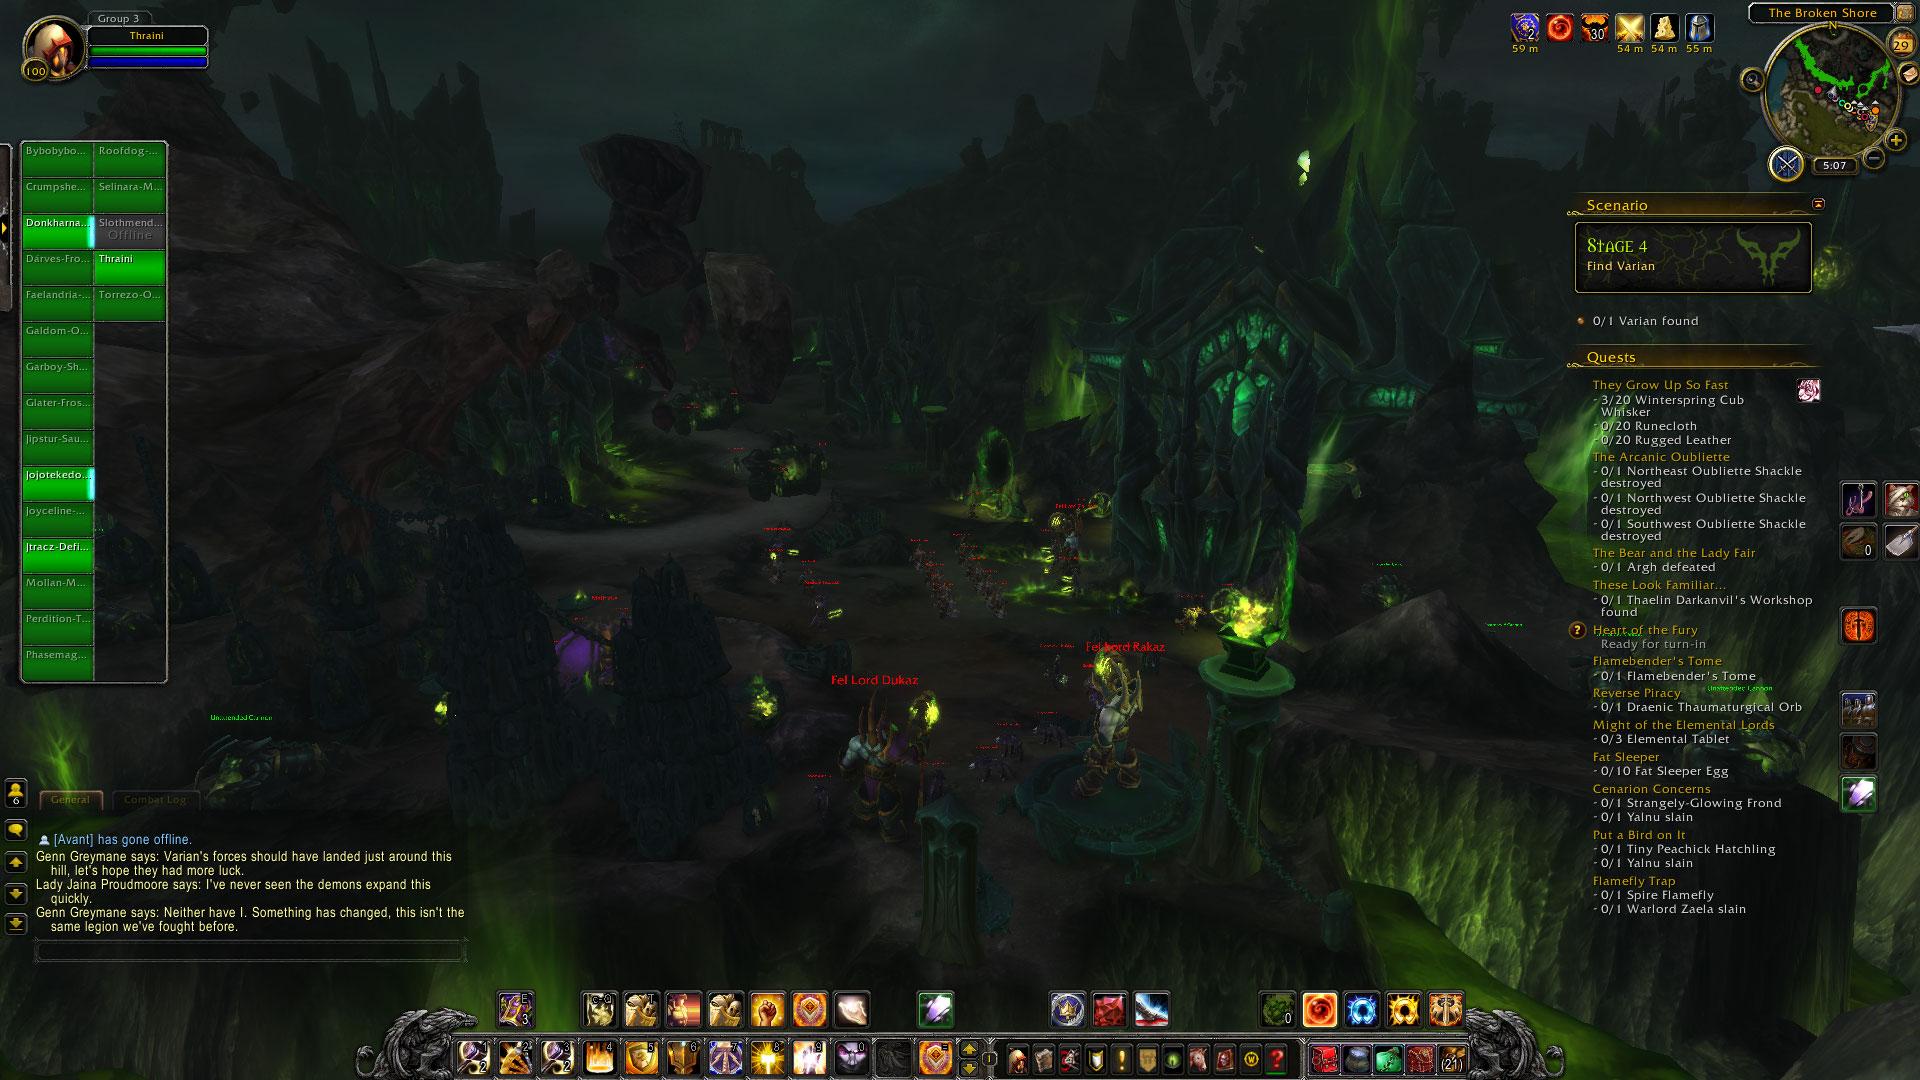 World of Warcraft: Legion fotoseriál - Plamenná legie přichází 129832